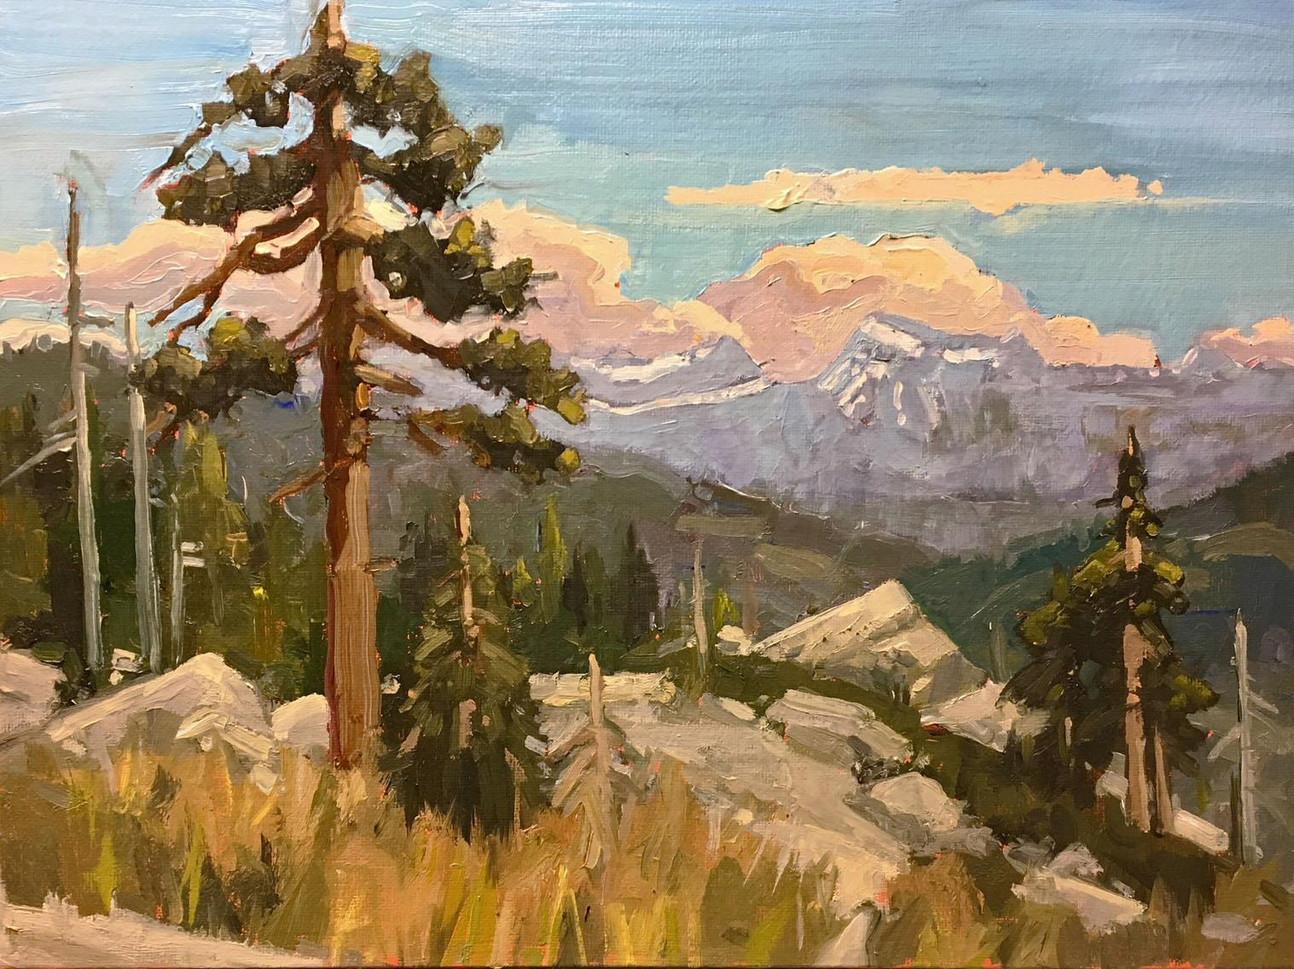 "Linda Abbott (Merced) Liberty Viewpoint, 2019 Oil on panel 12"" x 16"" $500"